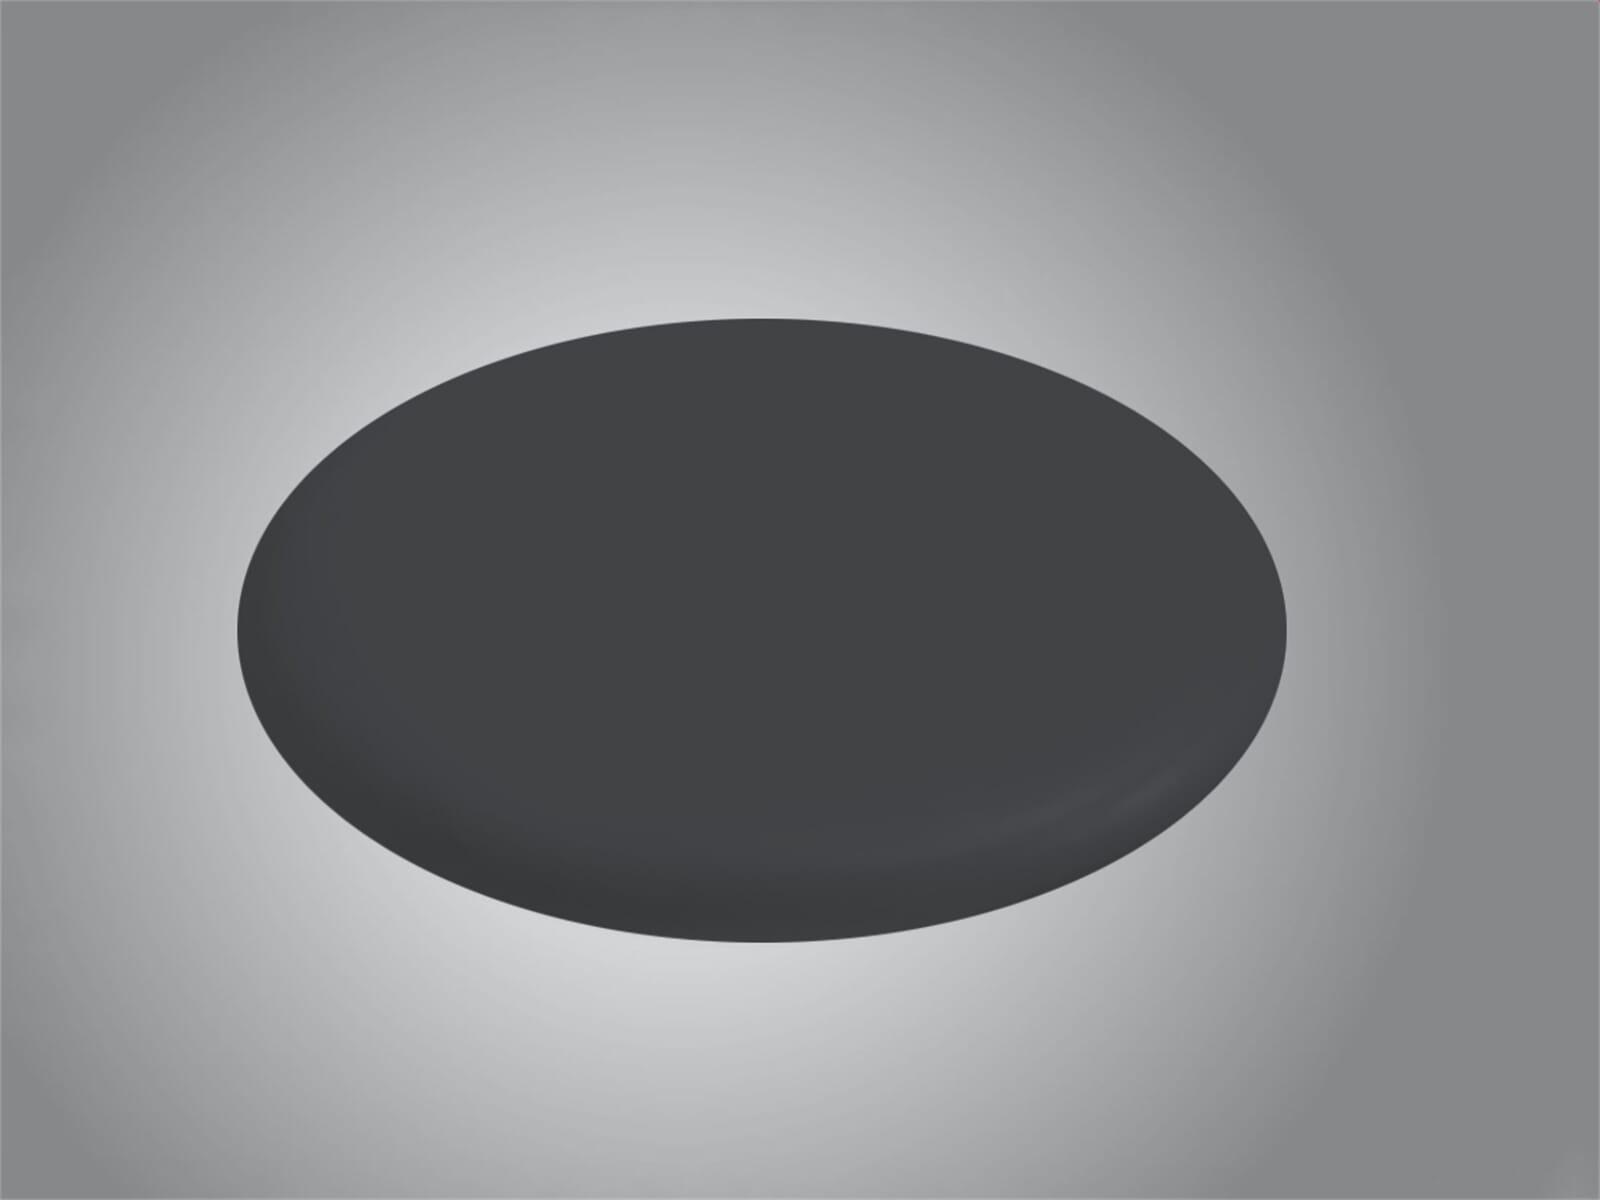 Systemceram Sink Cover Keramik Nigra 090687